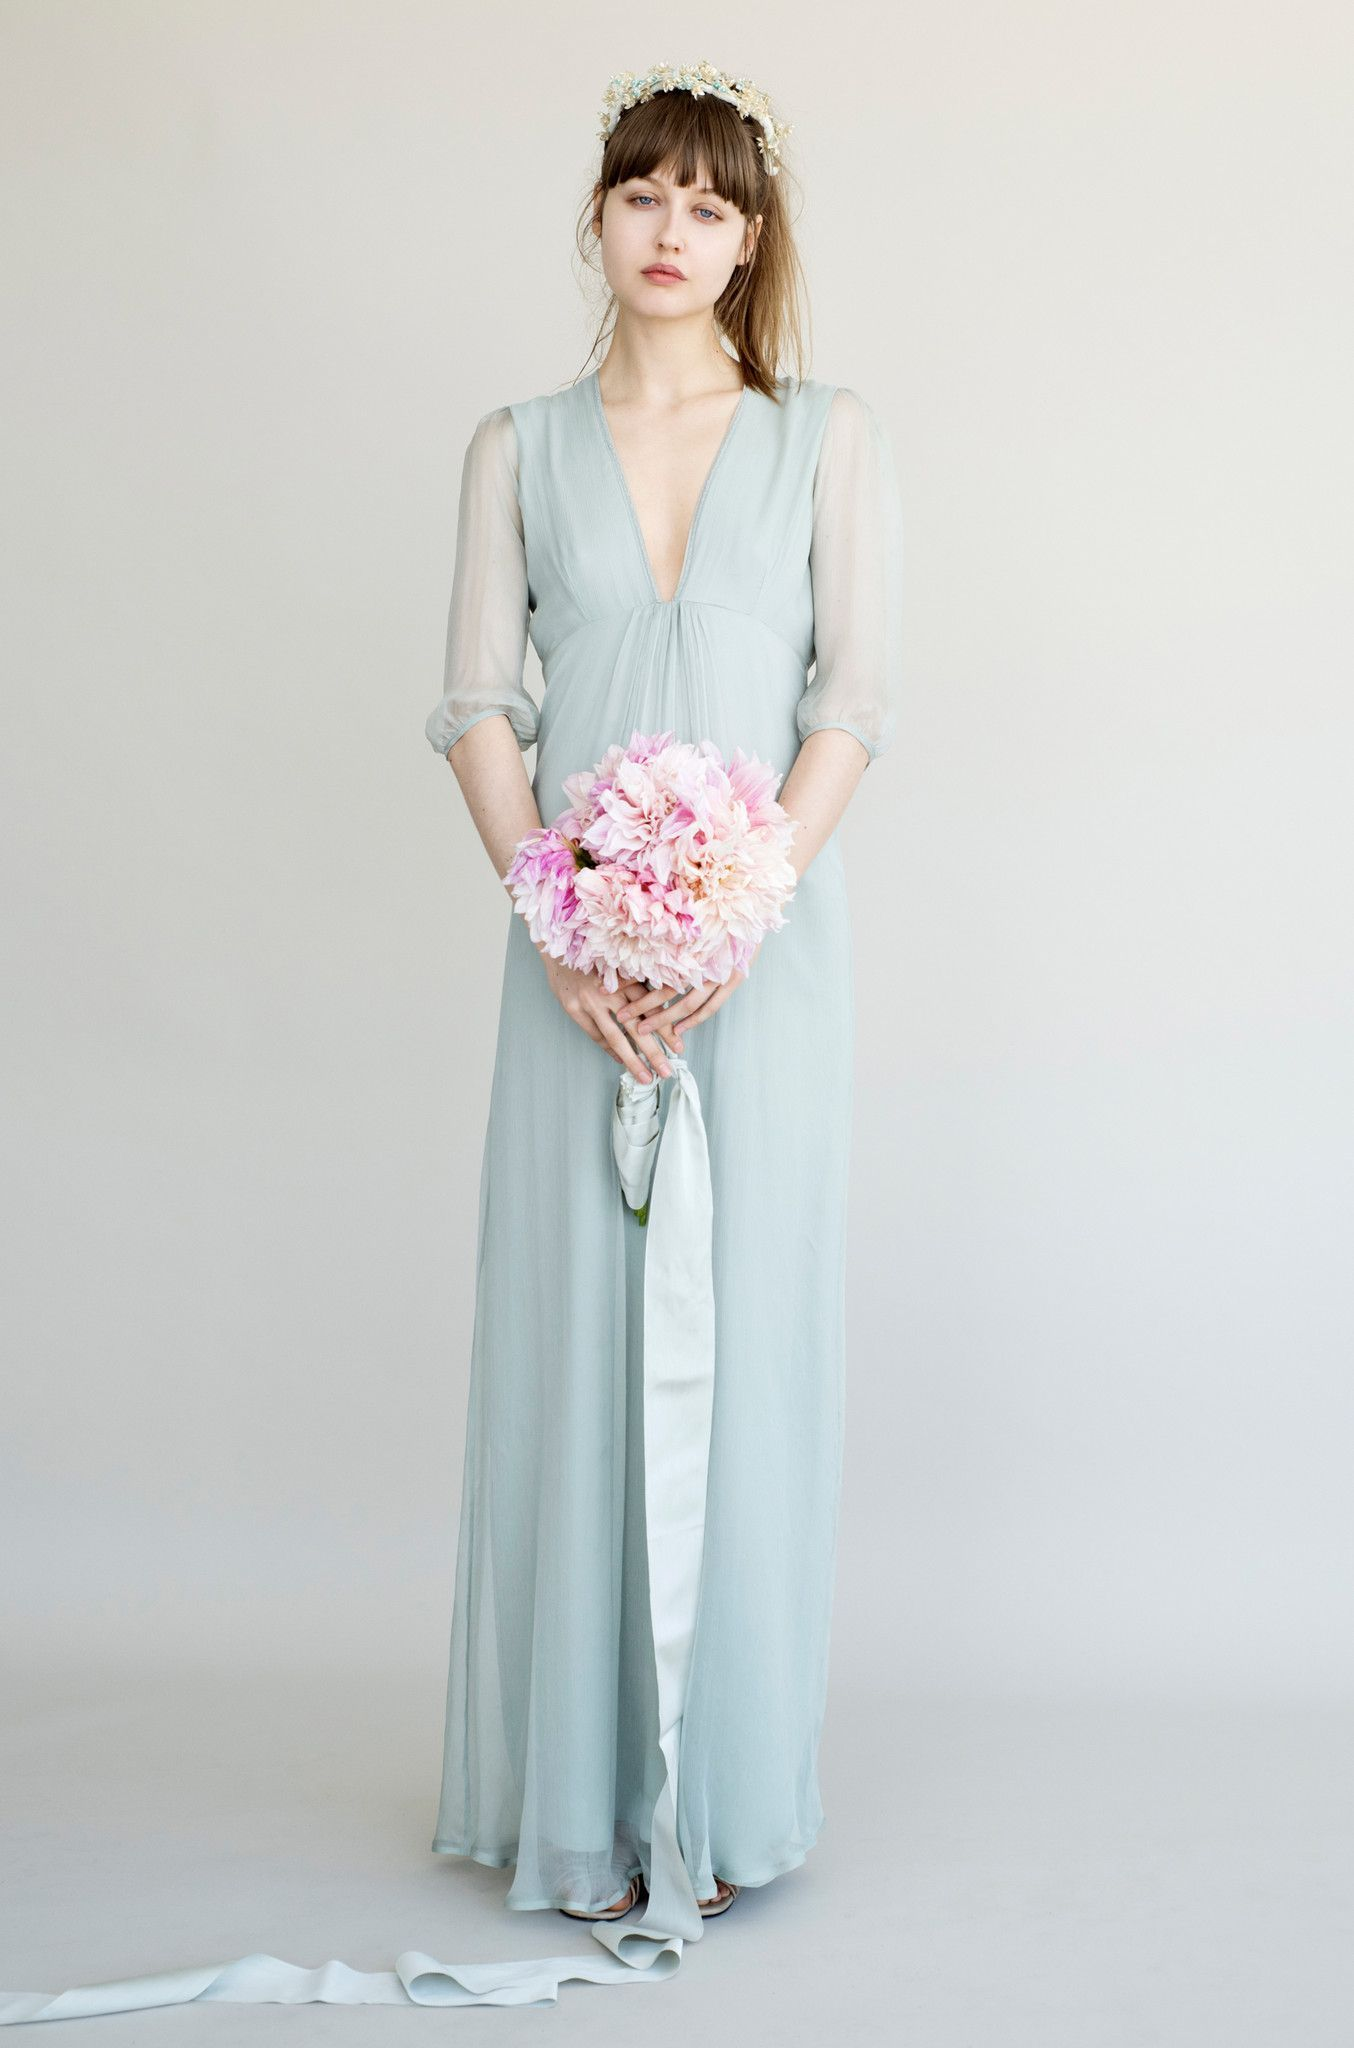 Helena u bespoke wedding products bespoke and wedding